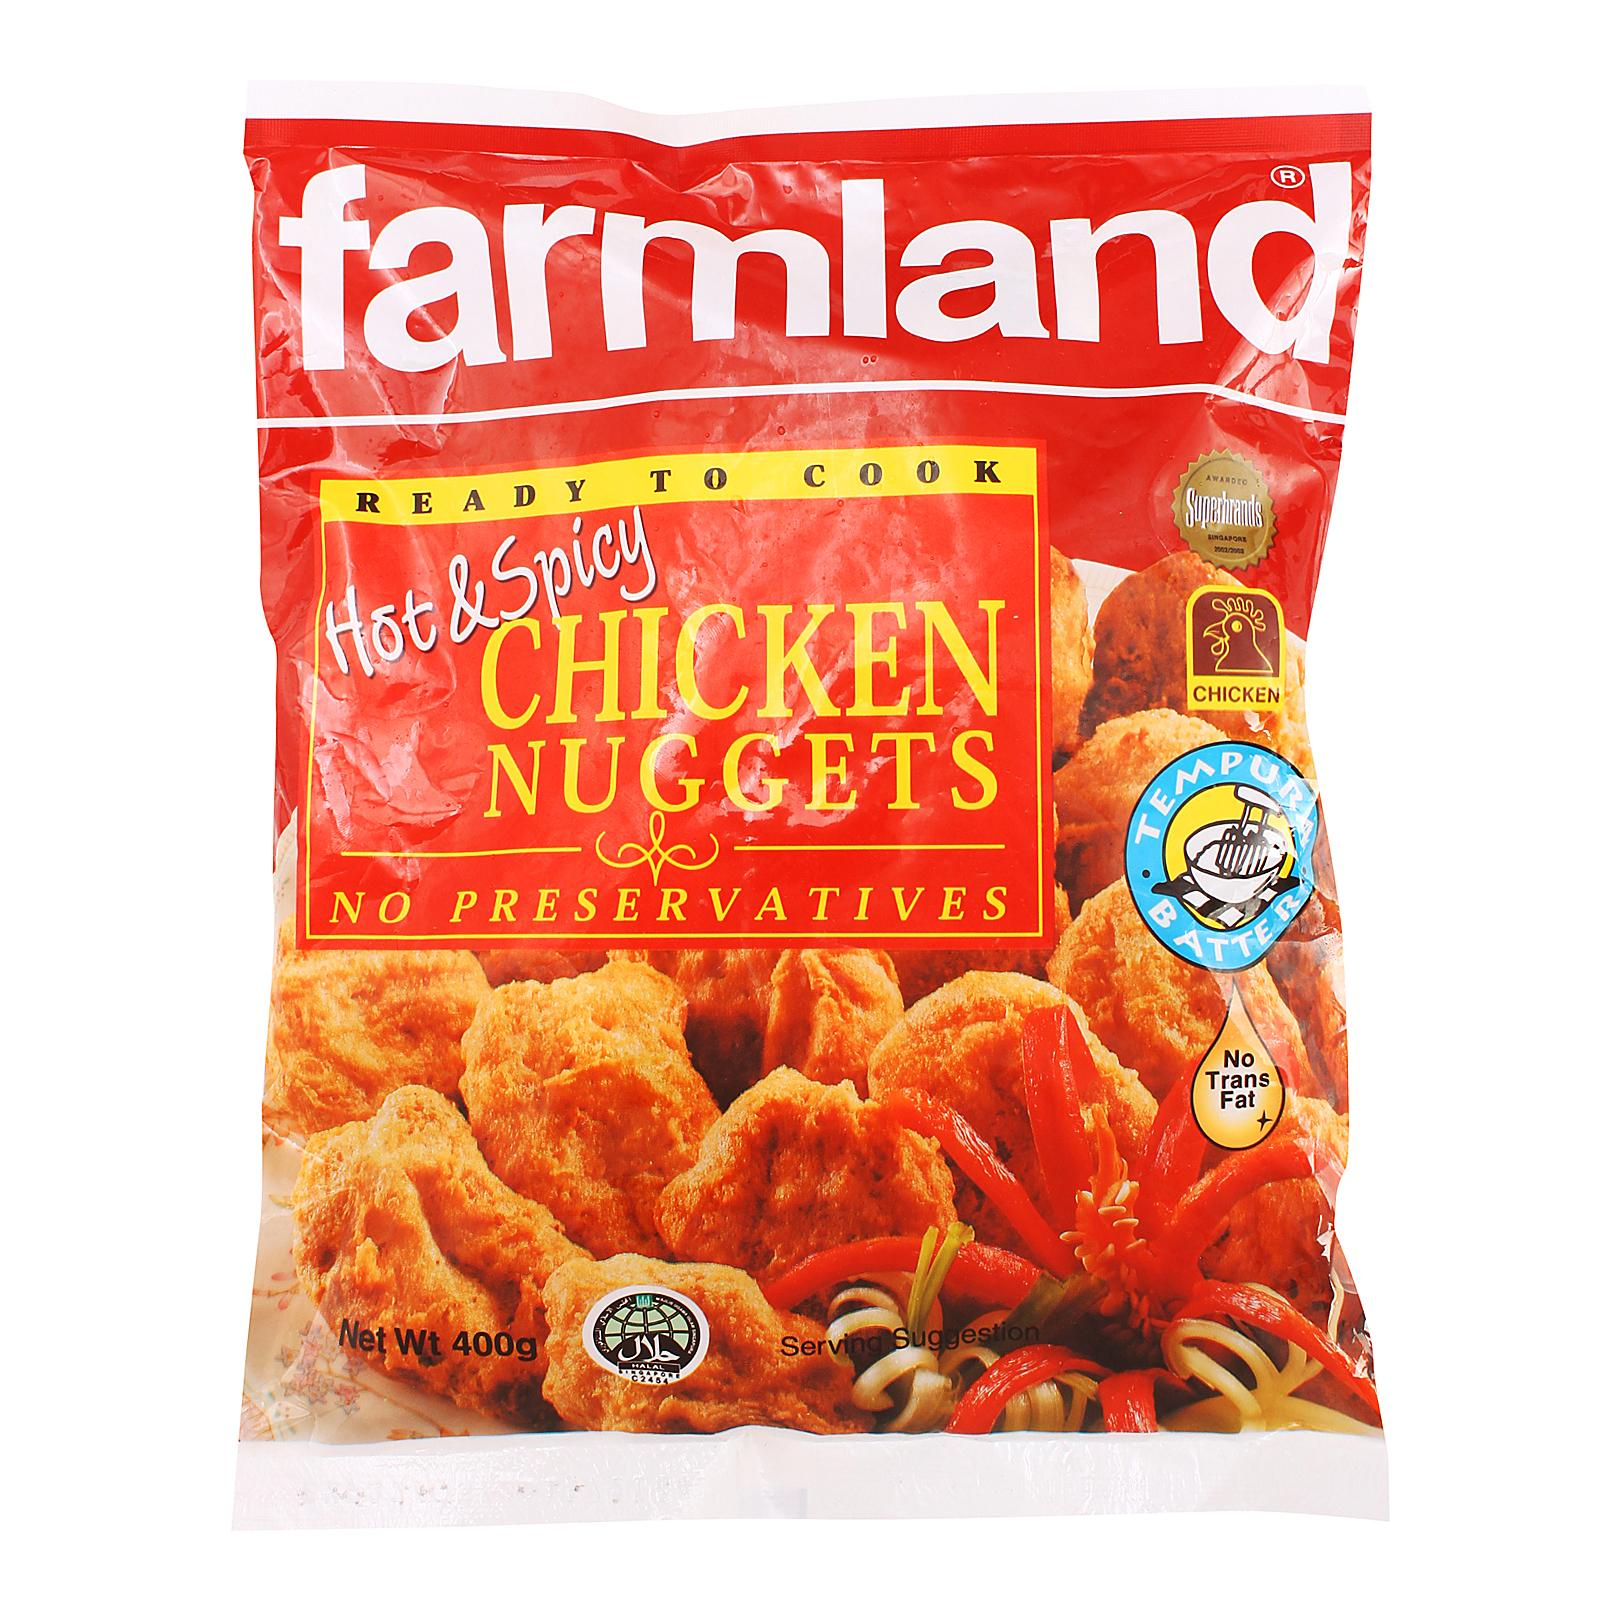 Farmland Hot And Spicy Chicken Nuggets - Frozen